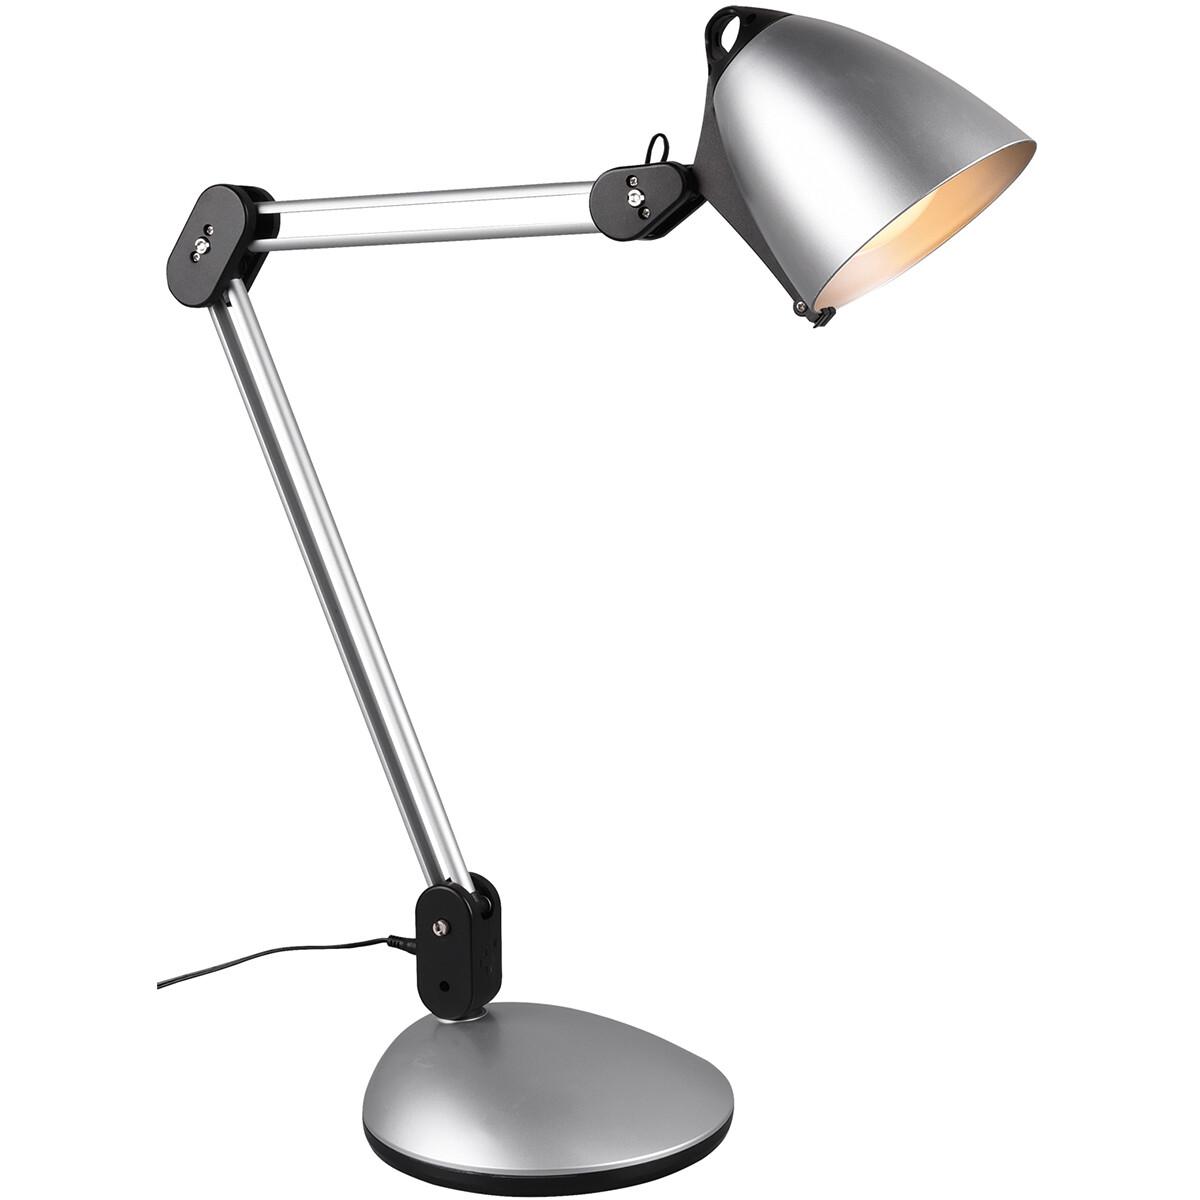 LED Tafellamp - Tafelverlichting - Trion Nadas - 6W - Aanpasbare Kleur - Dimbaar - Rond - Mat Titaan